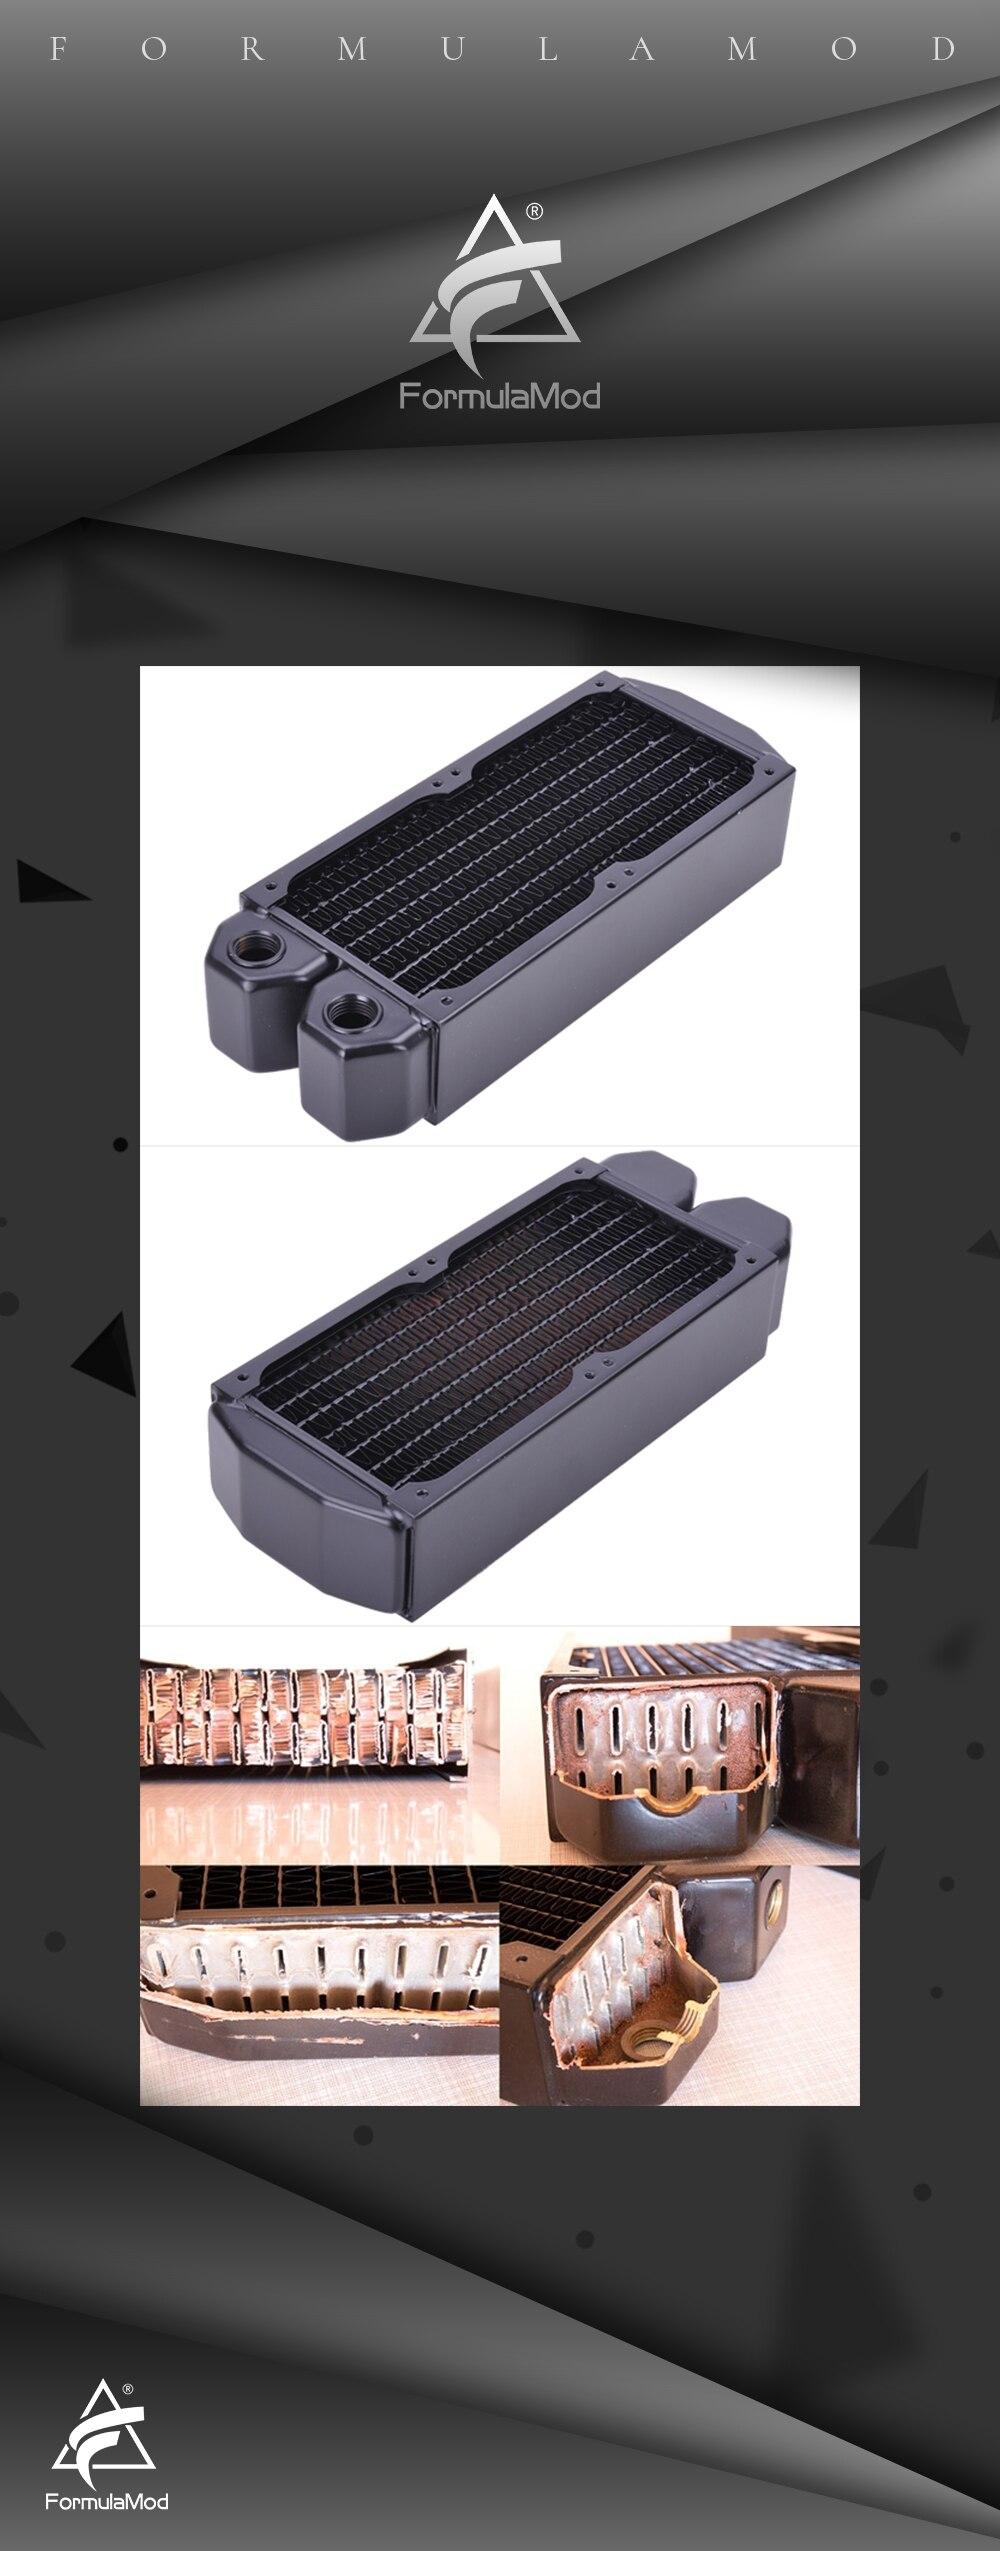 Cold row full copper radiator Alphacool NexXxoS XT45 2 * 80mm/160mm